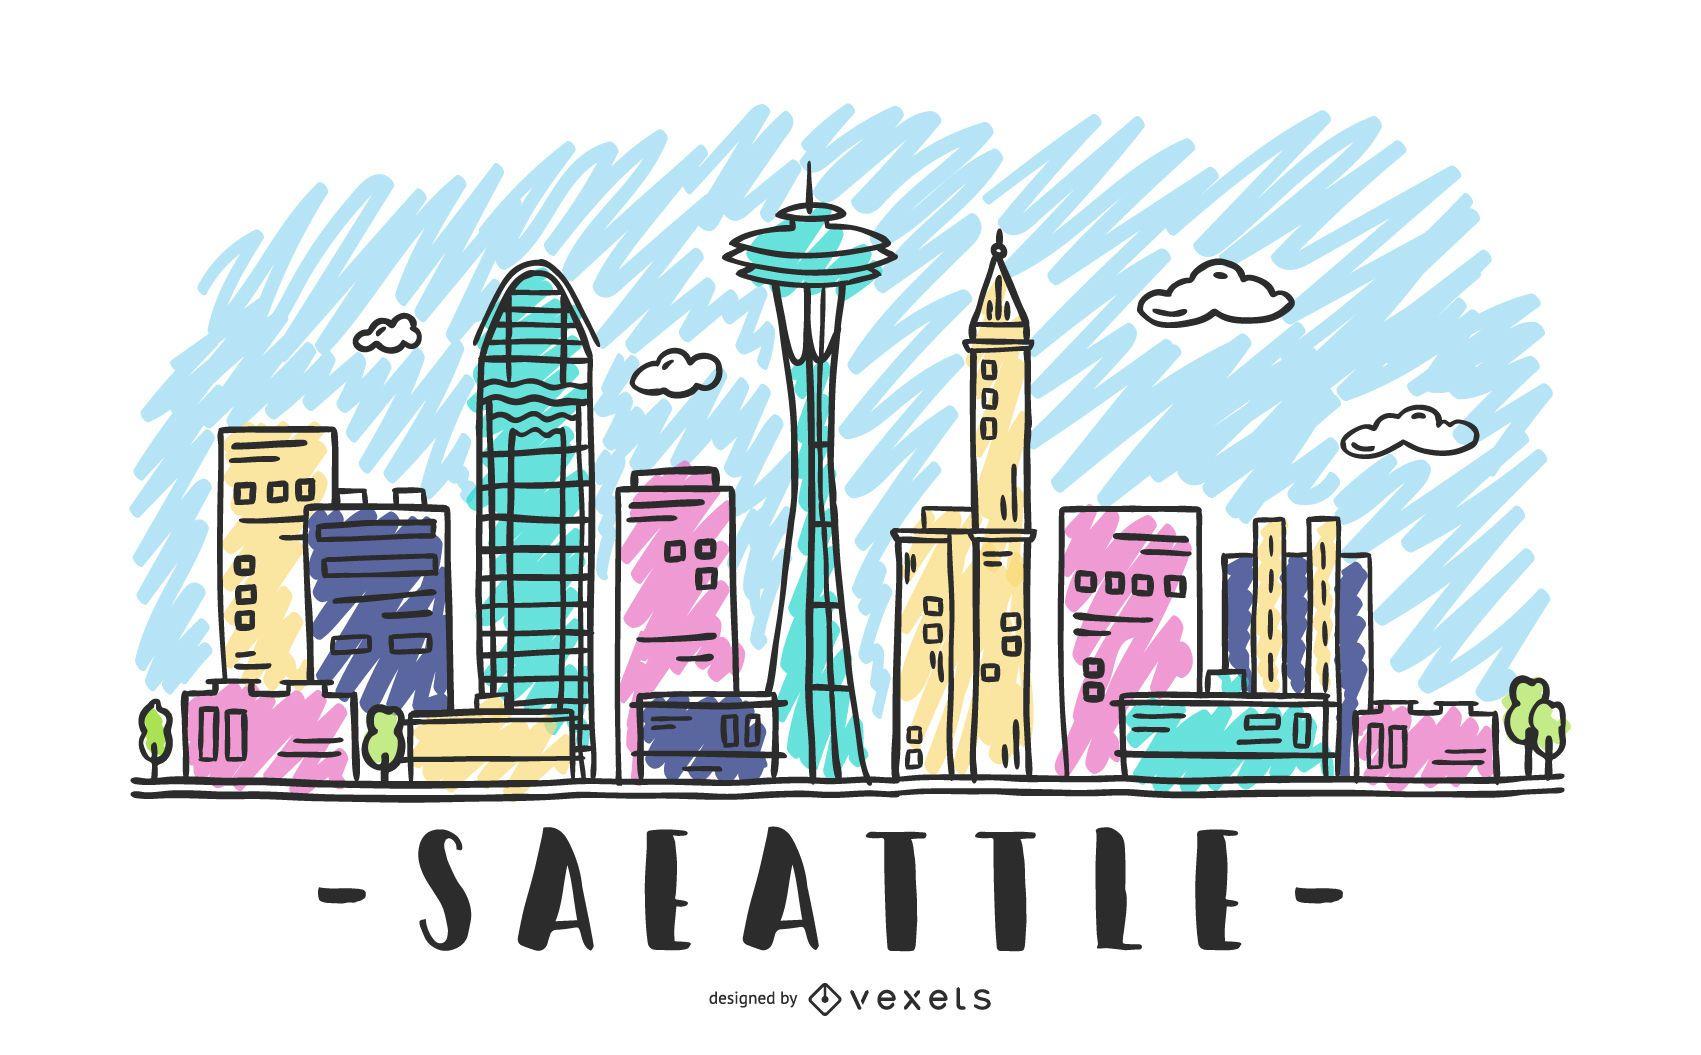 Seattle Skyline Design